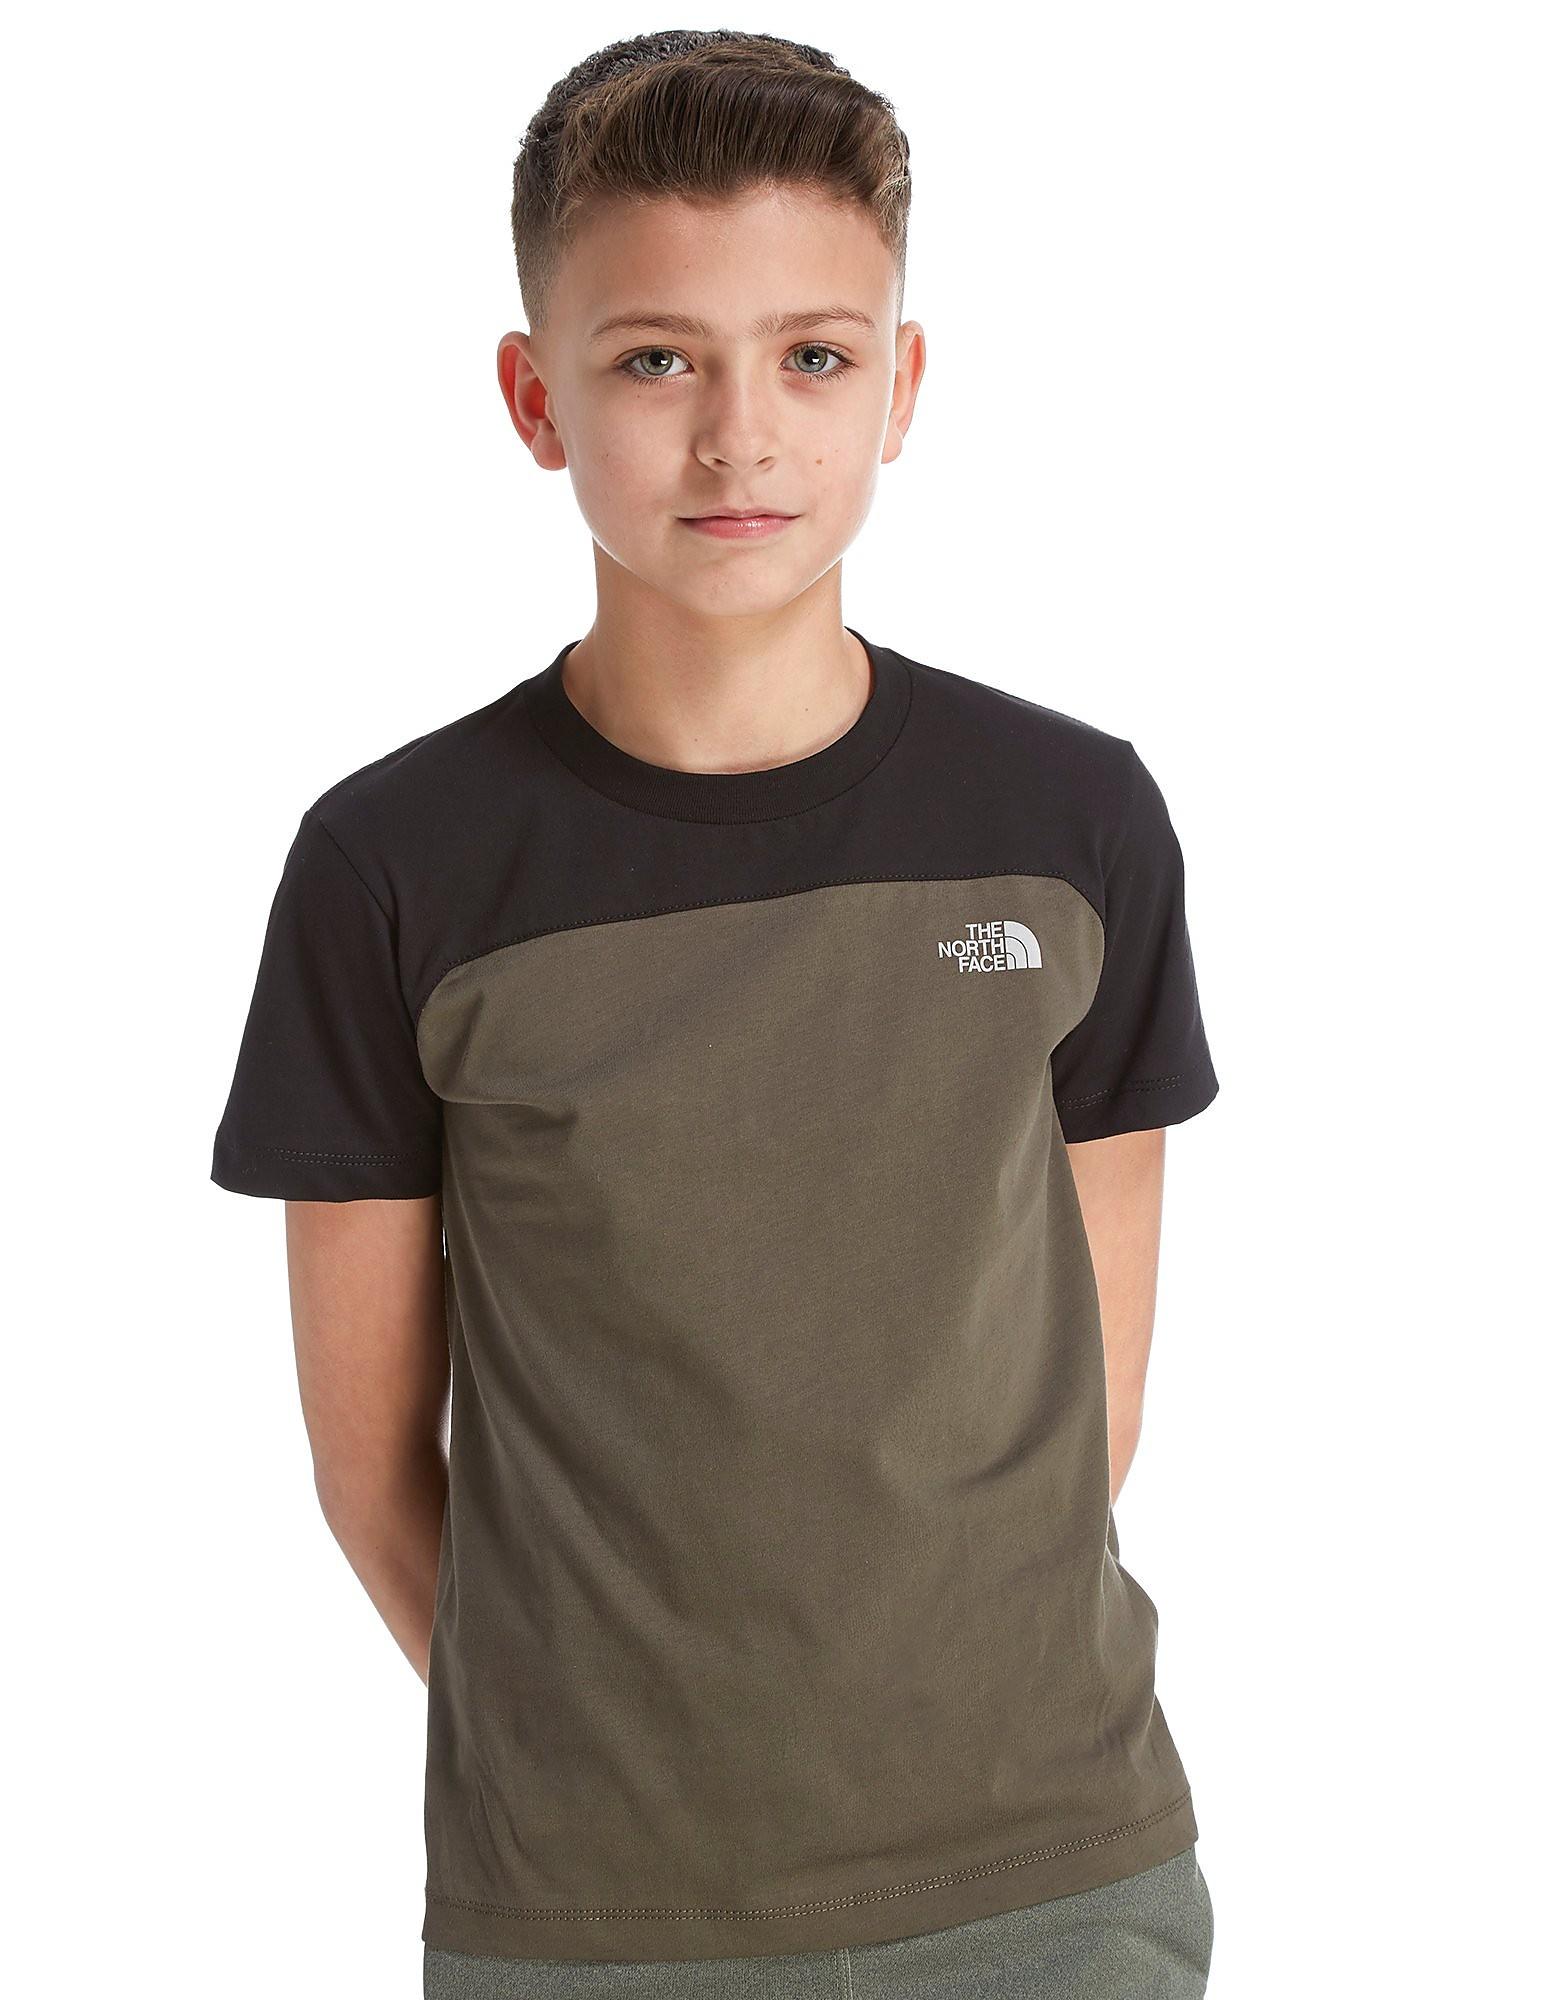 The North Face Colourblock T-Shirt Junior